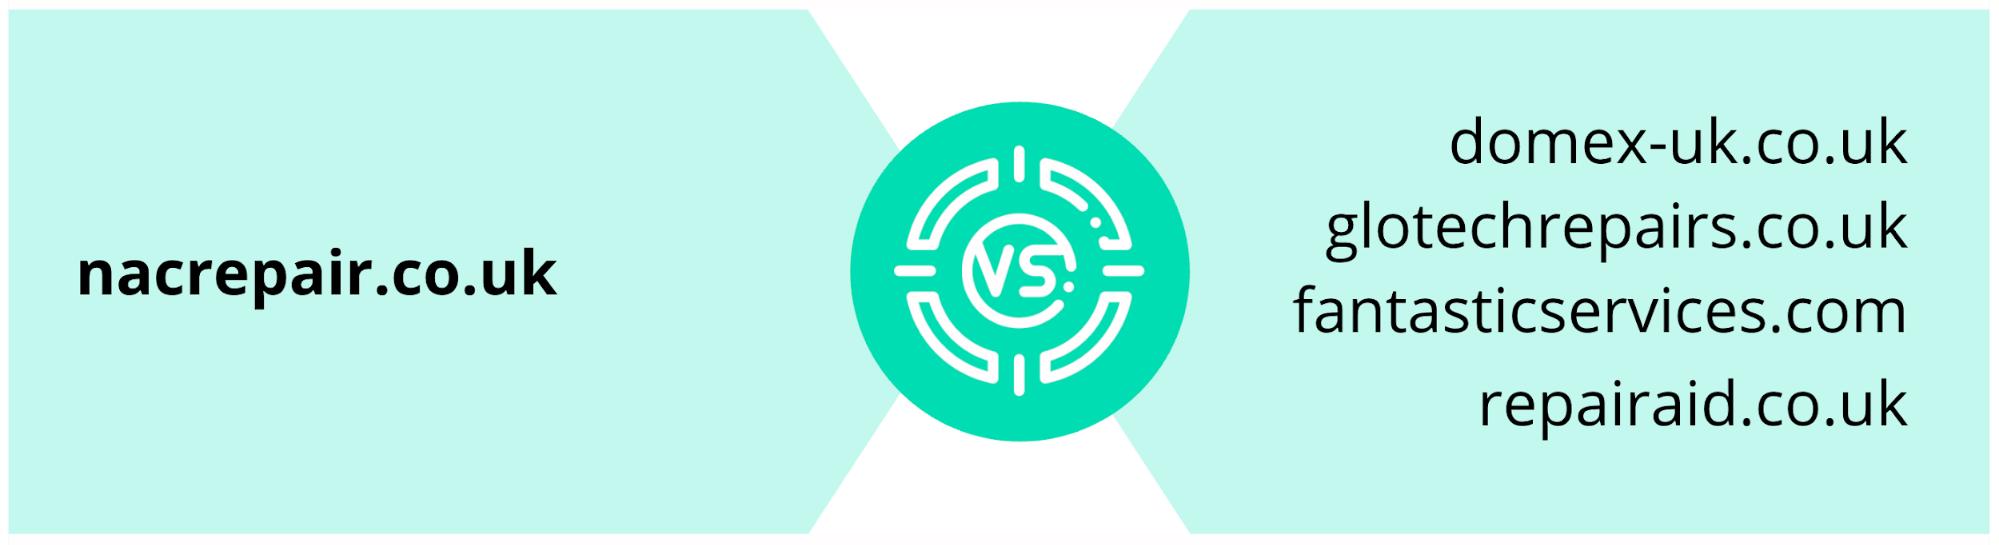 murray dare competitor analysis example washing machine repair company comparison 4